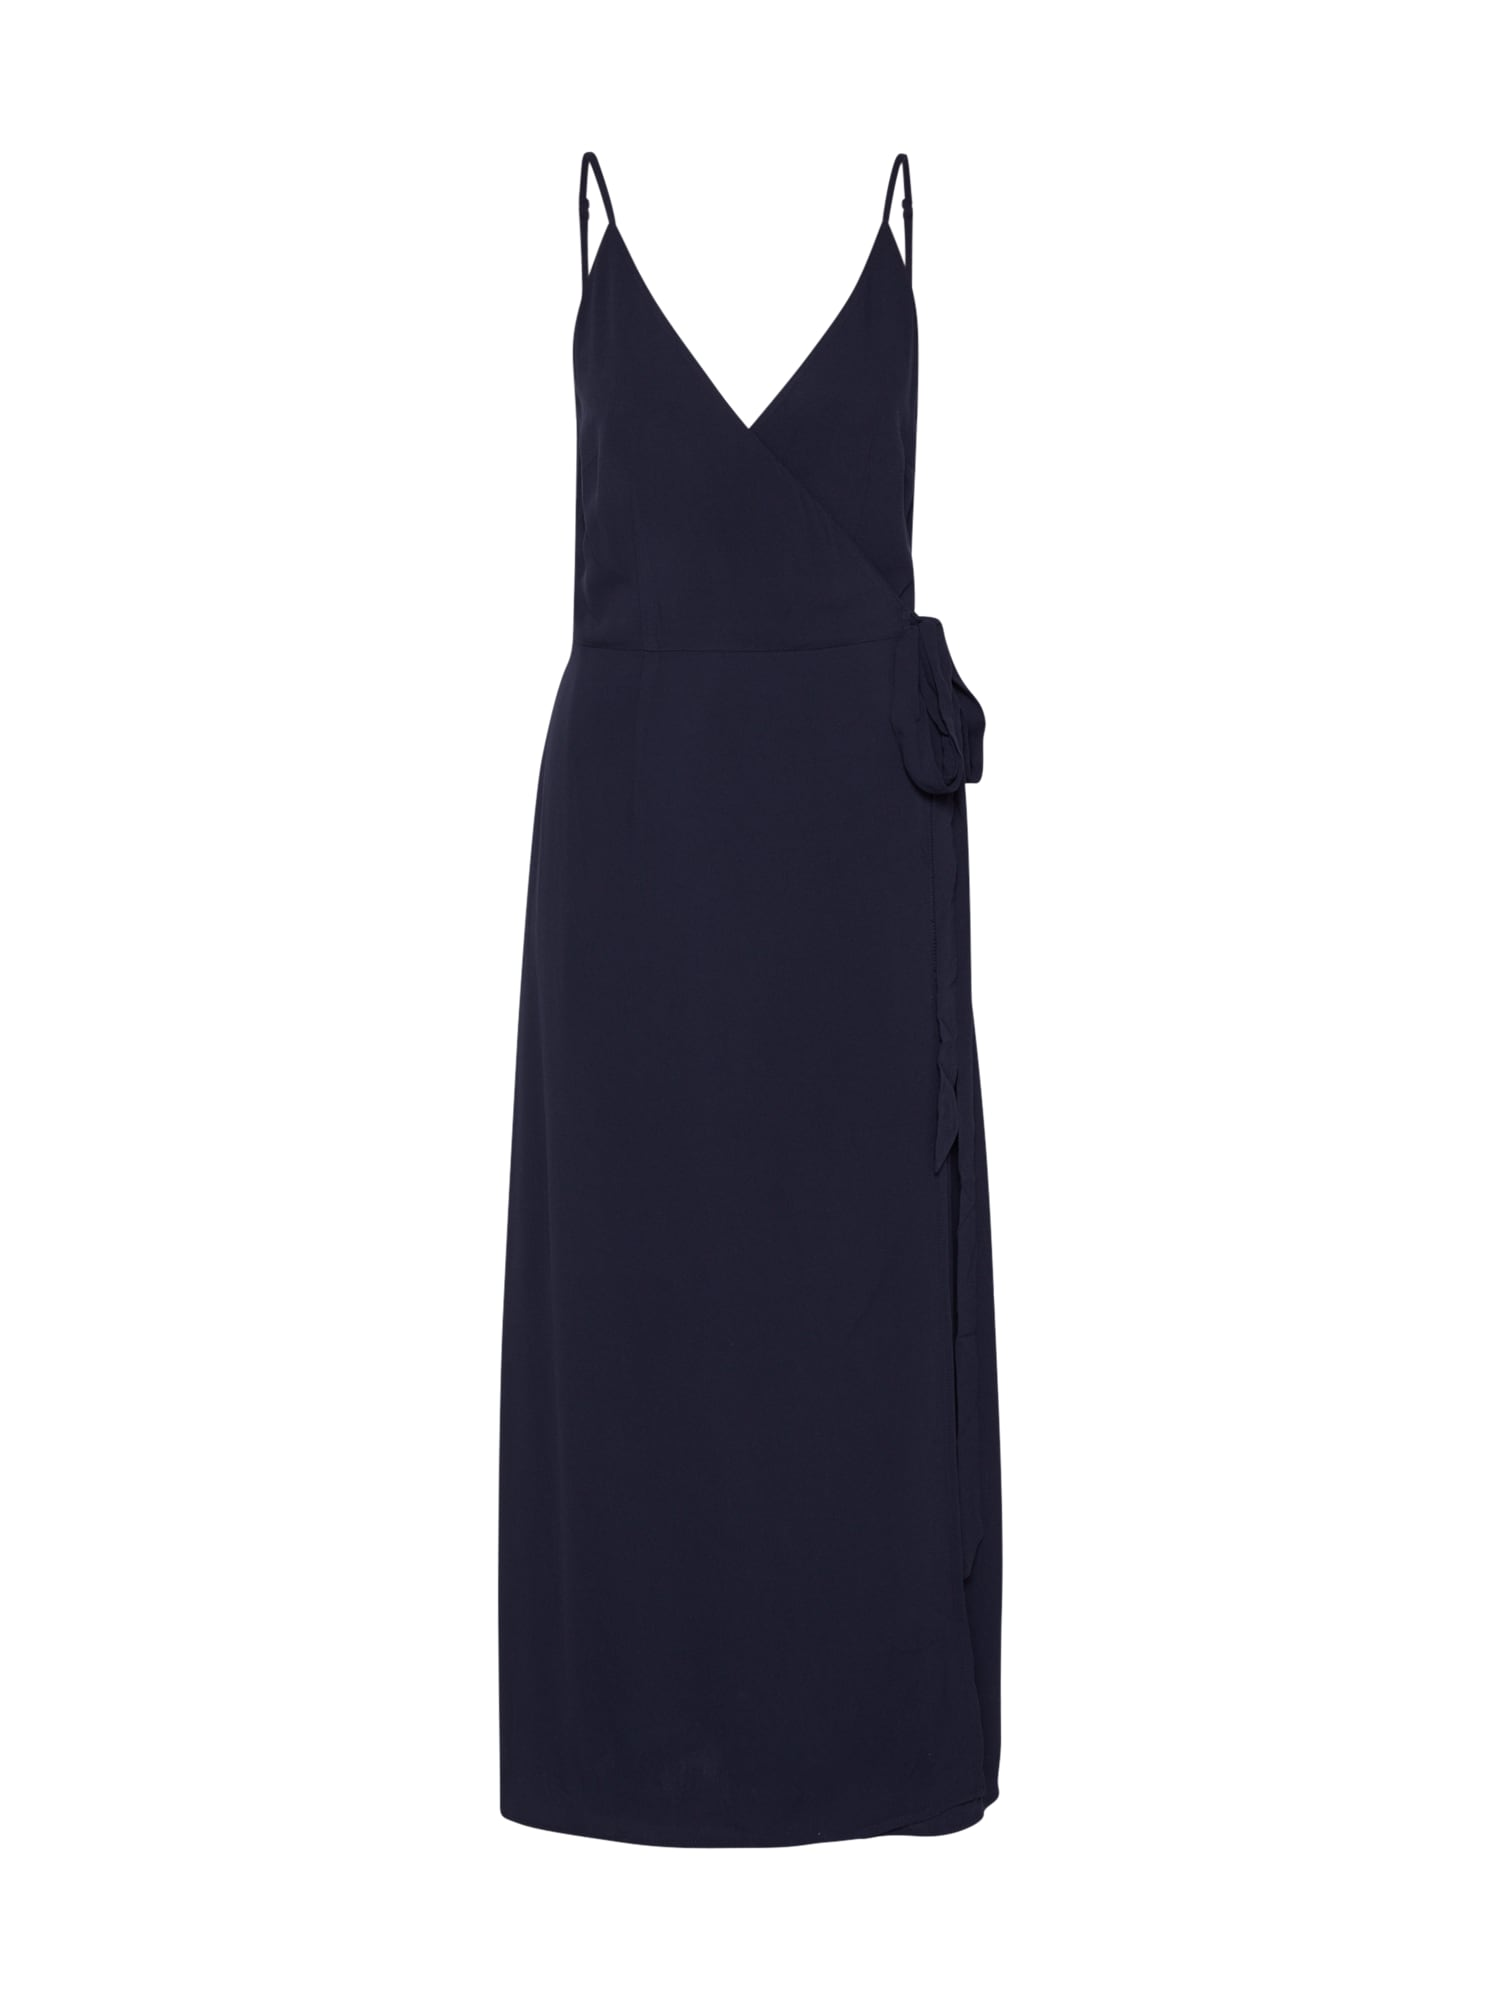 EDITED Vasarinė suknelė 'Roslyn' juoda